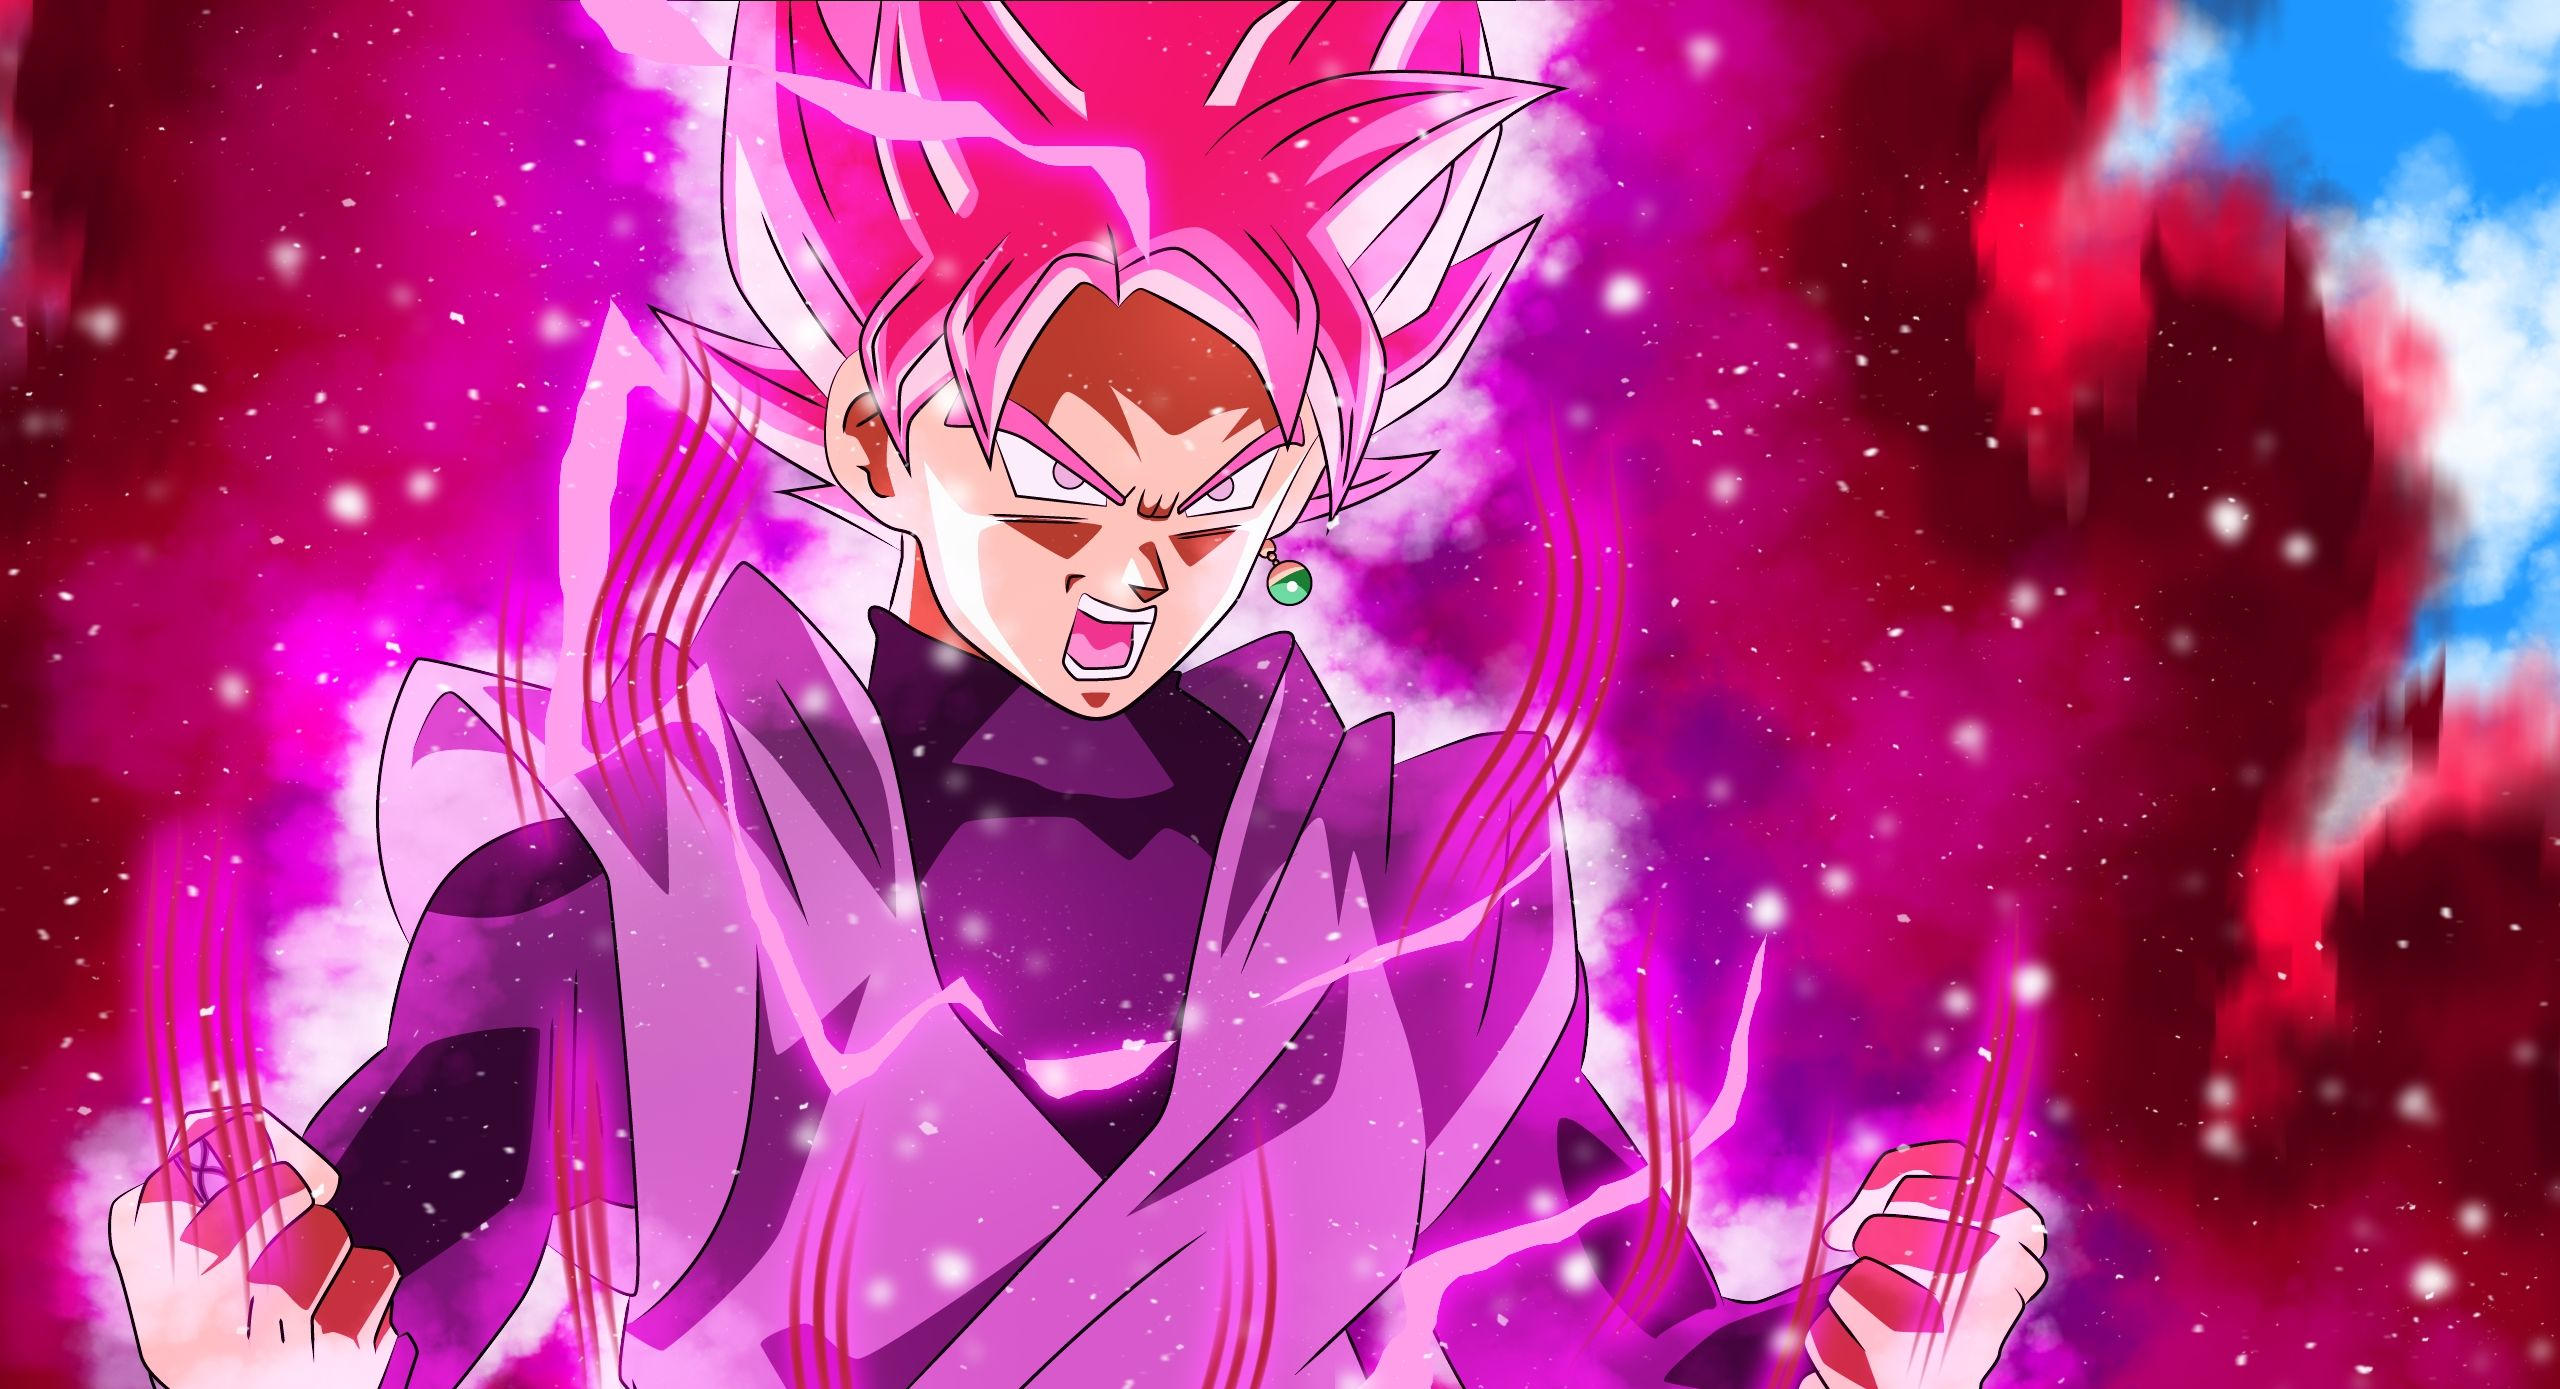 10 New Super Saiyan Rose Wallpaper Hd Full Hd 1920 1080 For Pc Desktop Anime Dragon Ball Super Dragon Ball Super Goku Goku Wallpaper